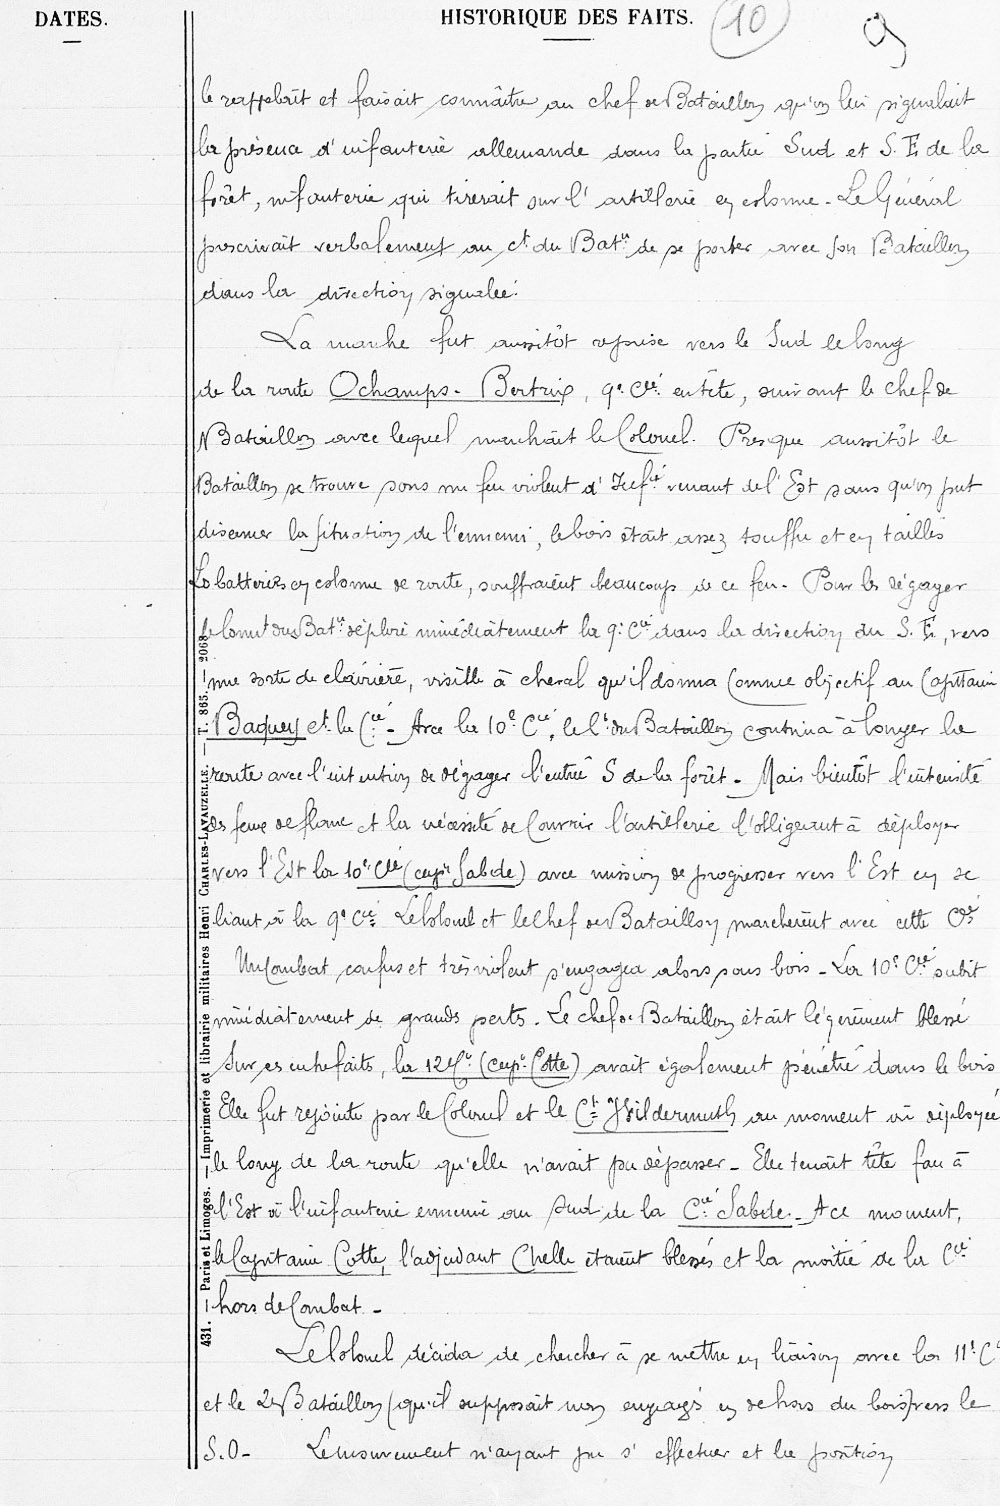 asu extrait jmo 11 RI page 5